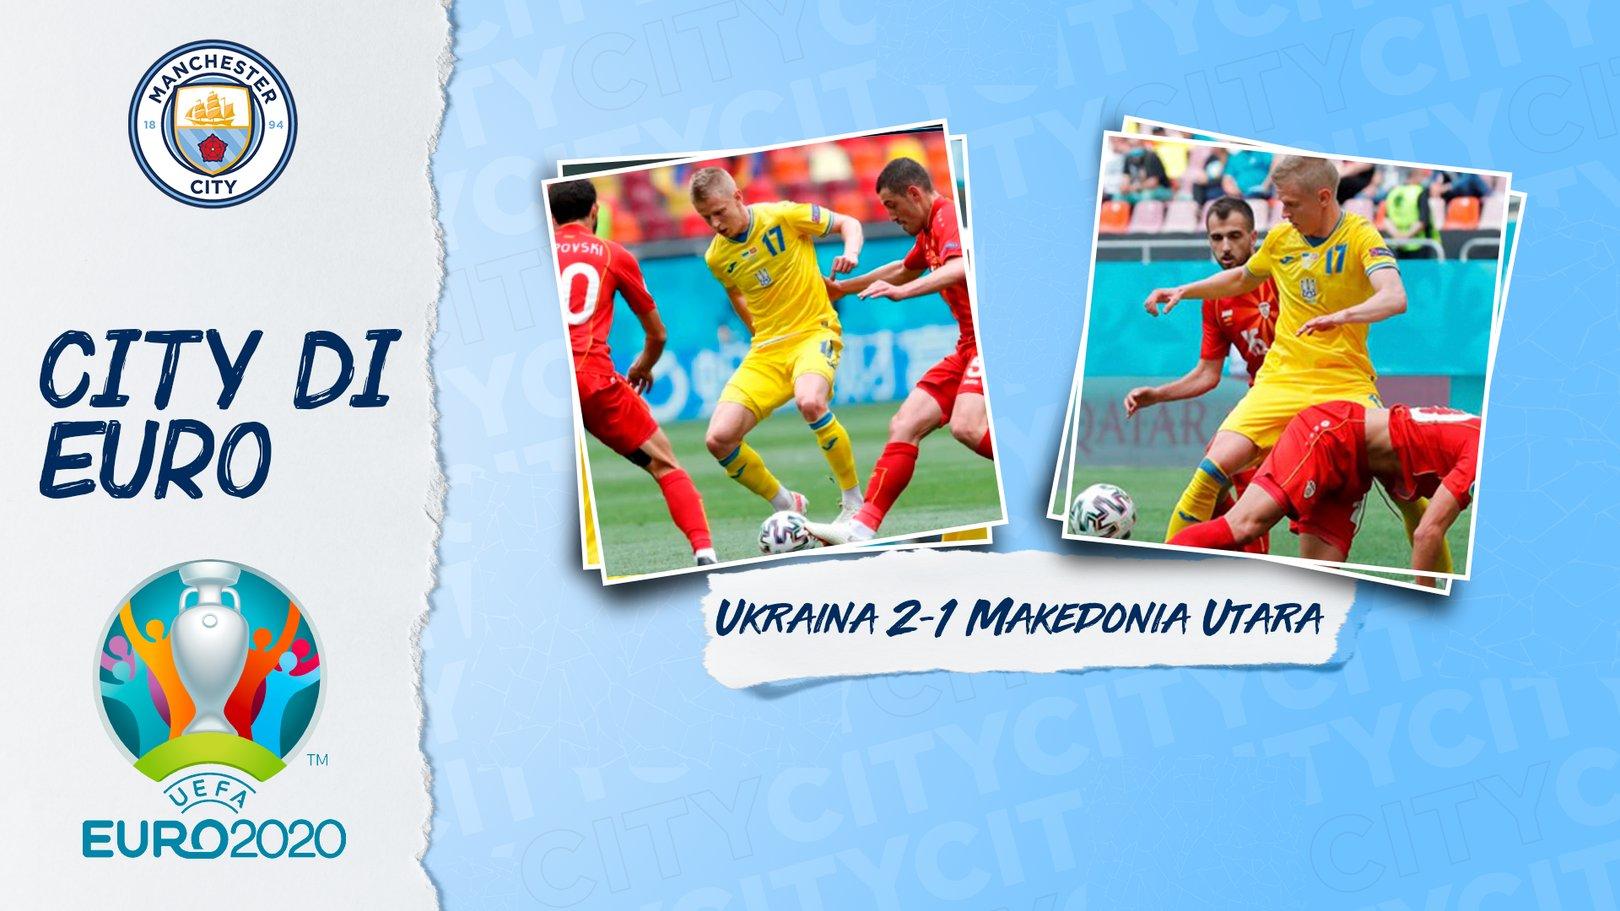 Zinchenko Membantu Ukraina Meraih Kemenangan Pertama Euro 2020